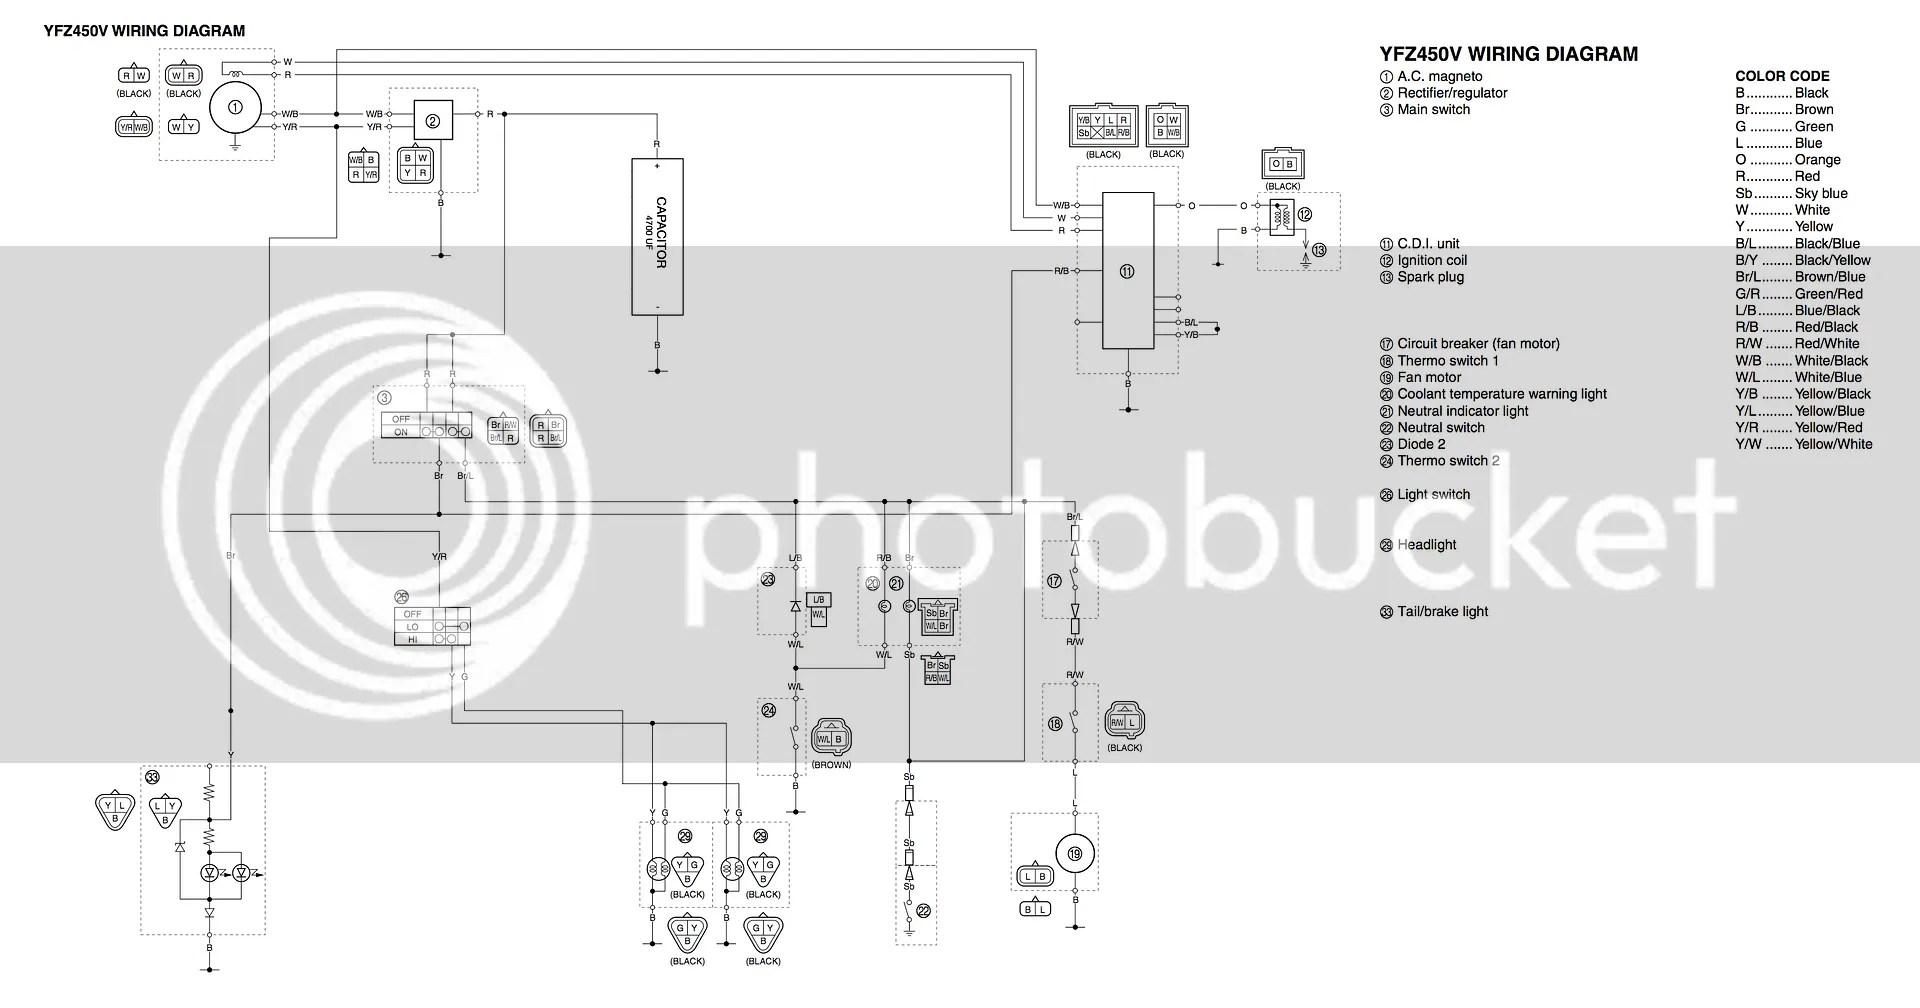 hight resolution of gutted harness diagrams yamaha yfz450 forum yfz450 yfz450r rh yfzcentral com 2007 yfz 450 headlight wiring